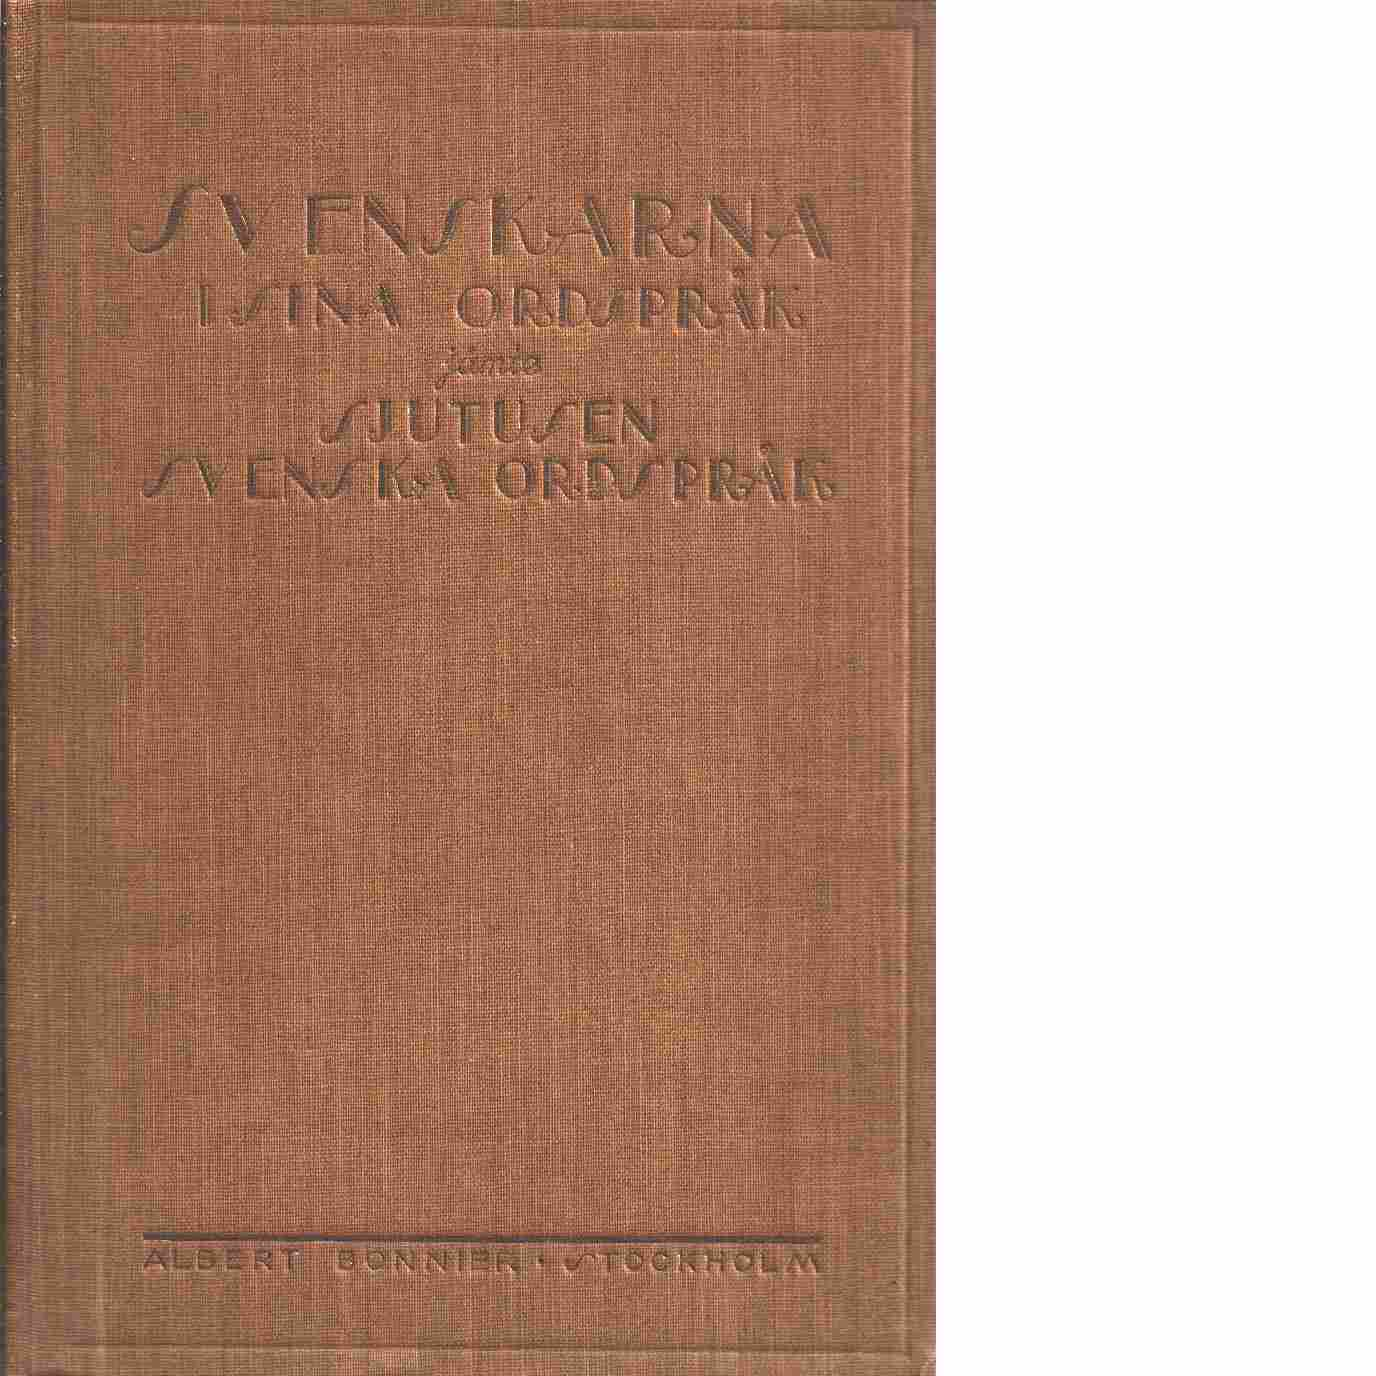 Svenskarna i sina ordspråk jämte sju tusen svenska ordspråk - Ström, Fredrik